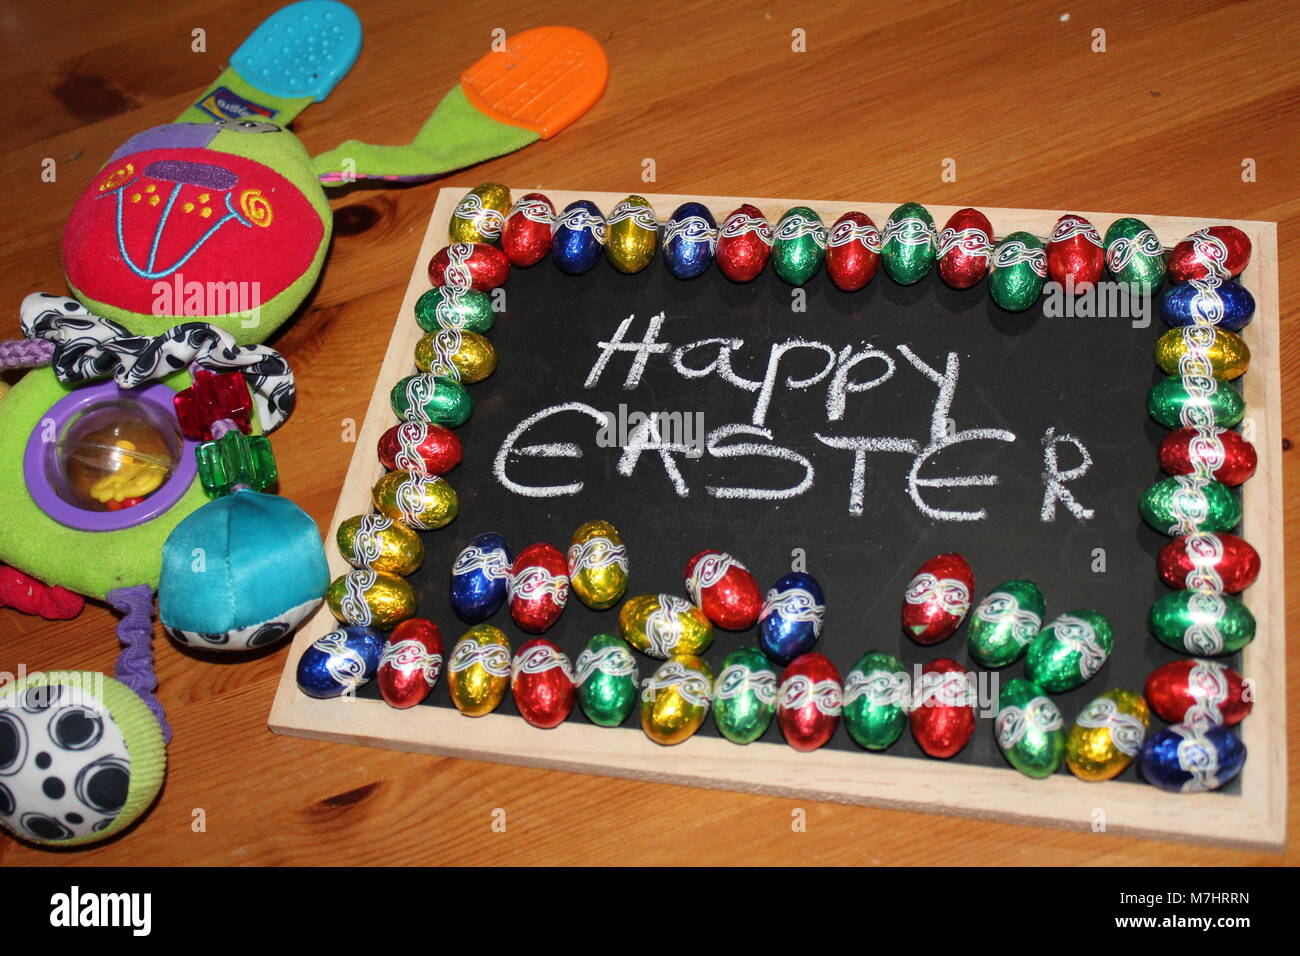 Happy easter bunny baby teething toy - Stock Image